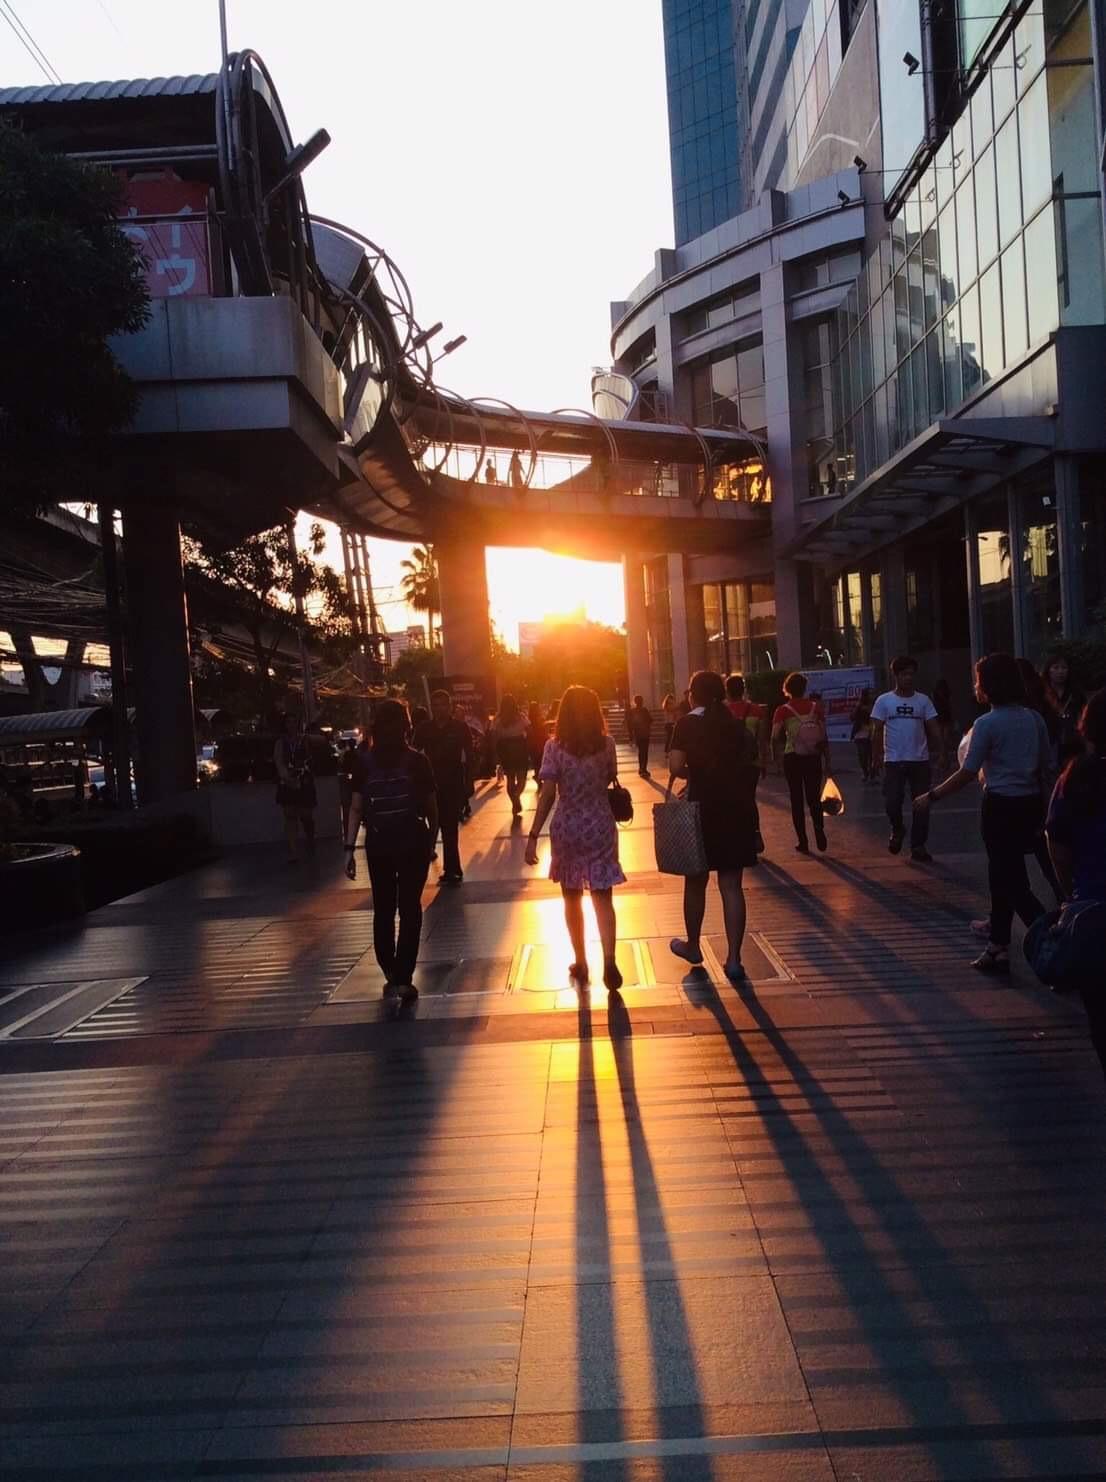 SCATTERED SUNSET LIGHTS THROUGH PEOPLE 🌇🌆👨🏻👩🏻 ( แสงอัสดงส่องผ่านผู้คน 🌇🌆👨🏻👩🏻 )